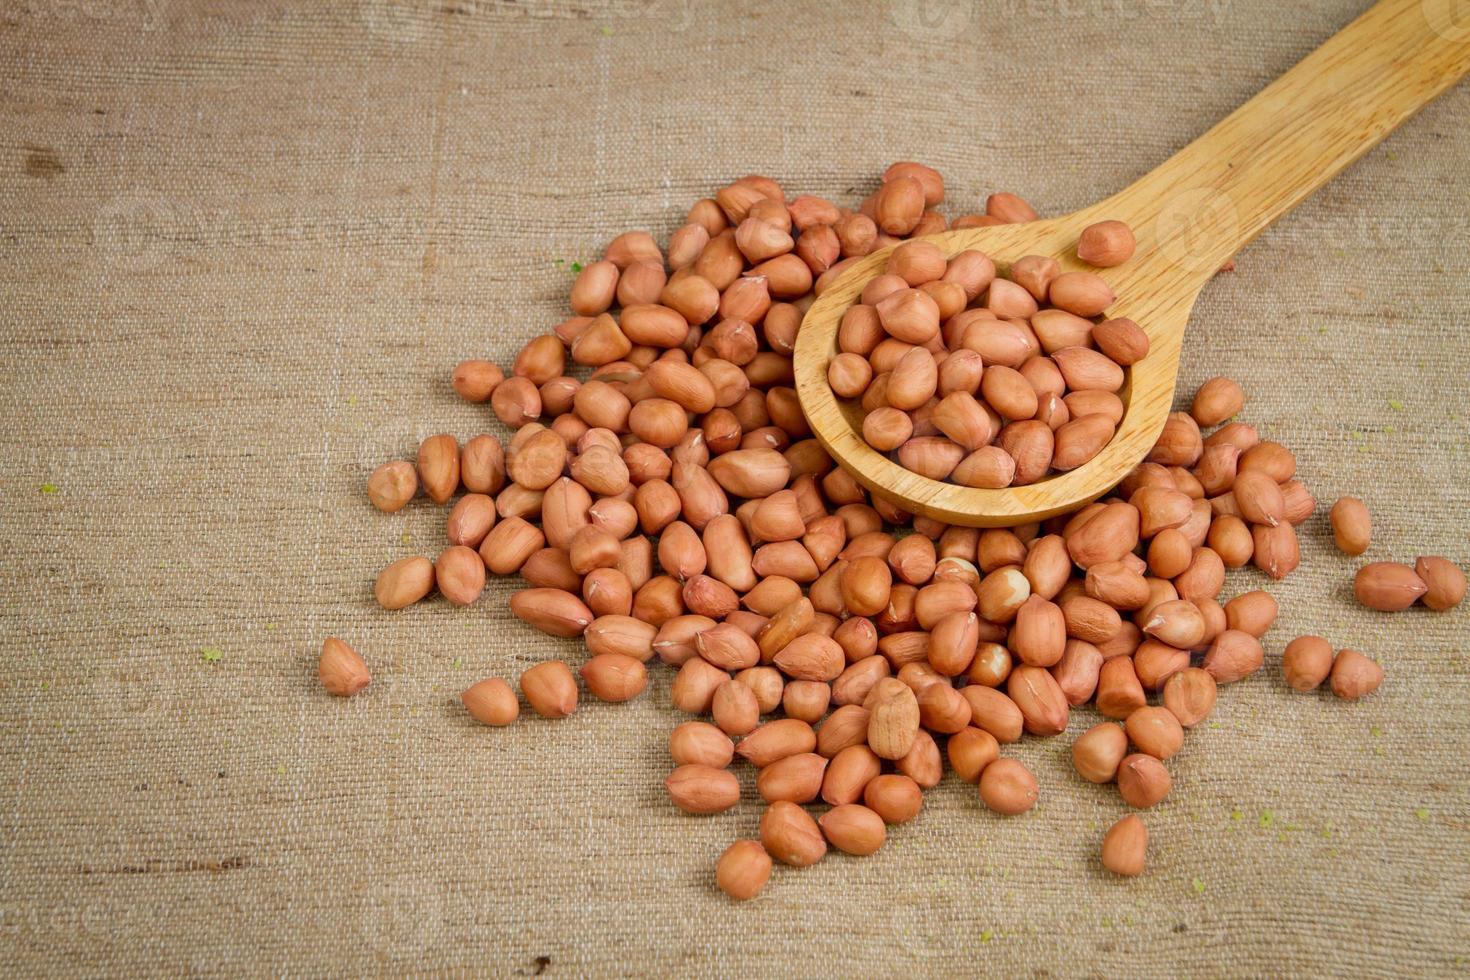 foto di arachidi vietnamite o arachidi.